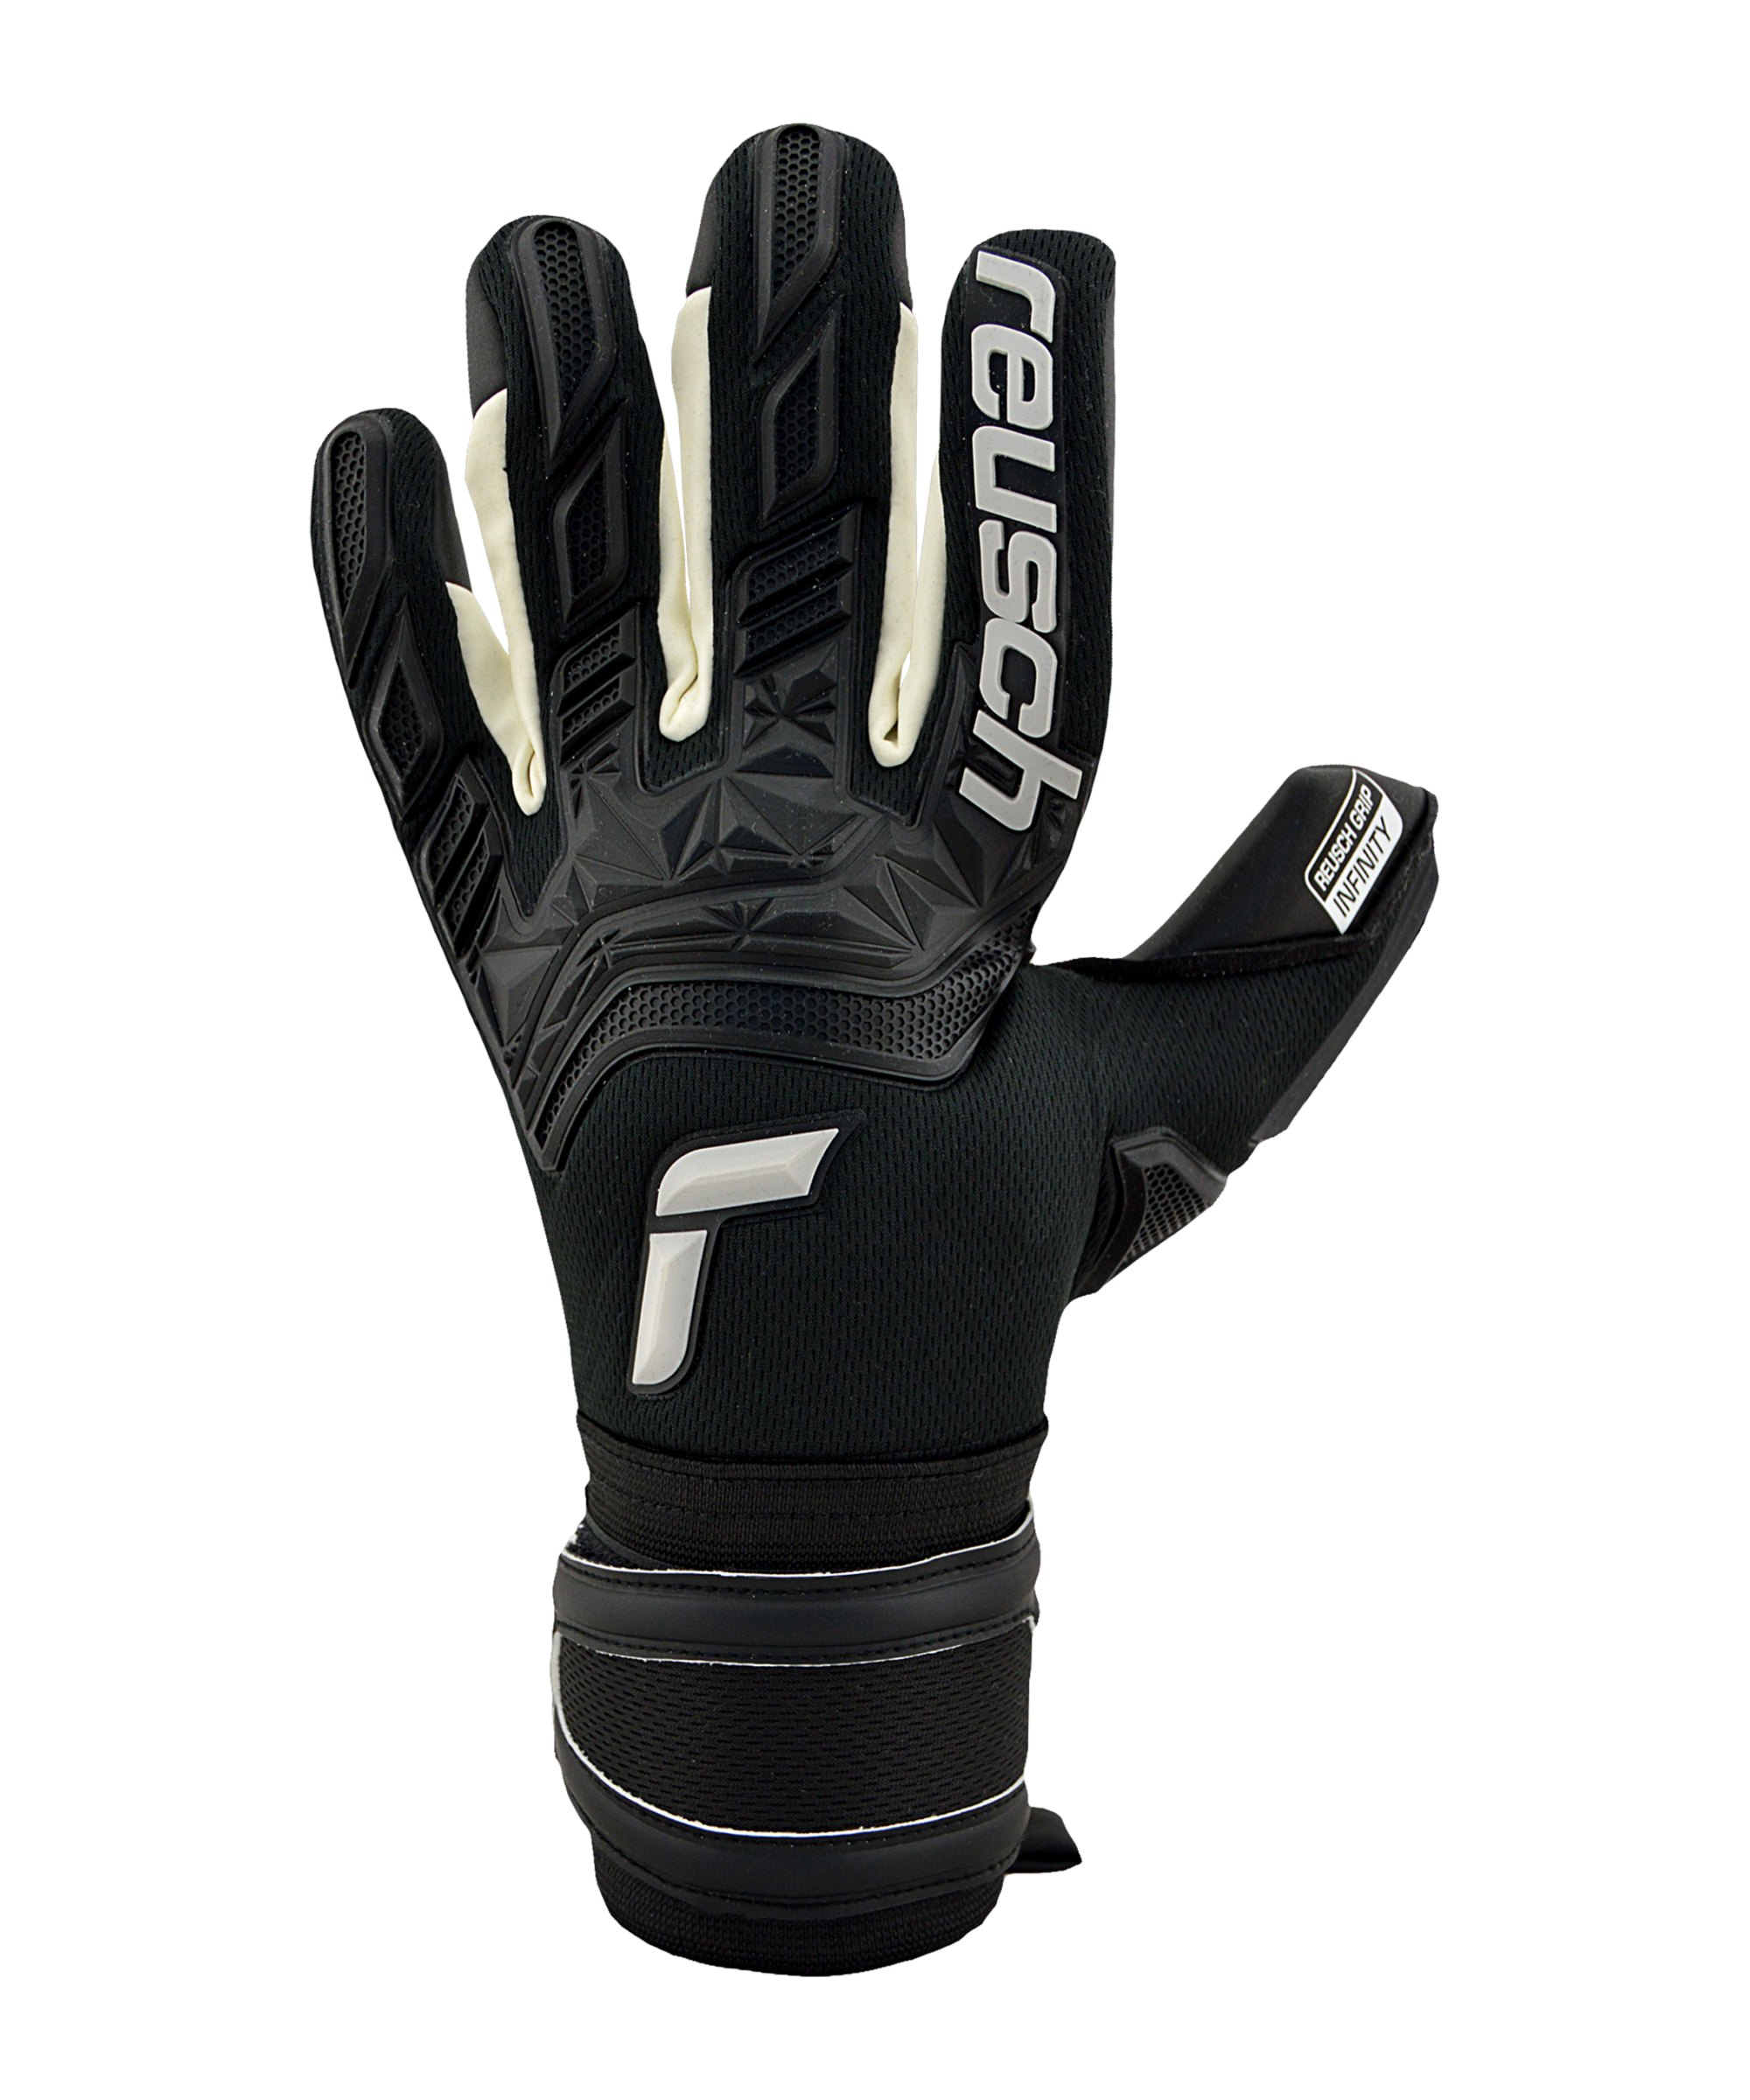 Reusch Attrakt Freegel Infinity TW-Handschuh F7700 - schwarz